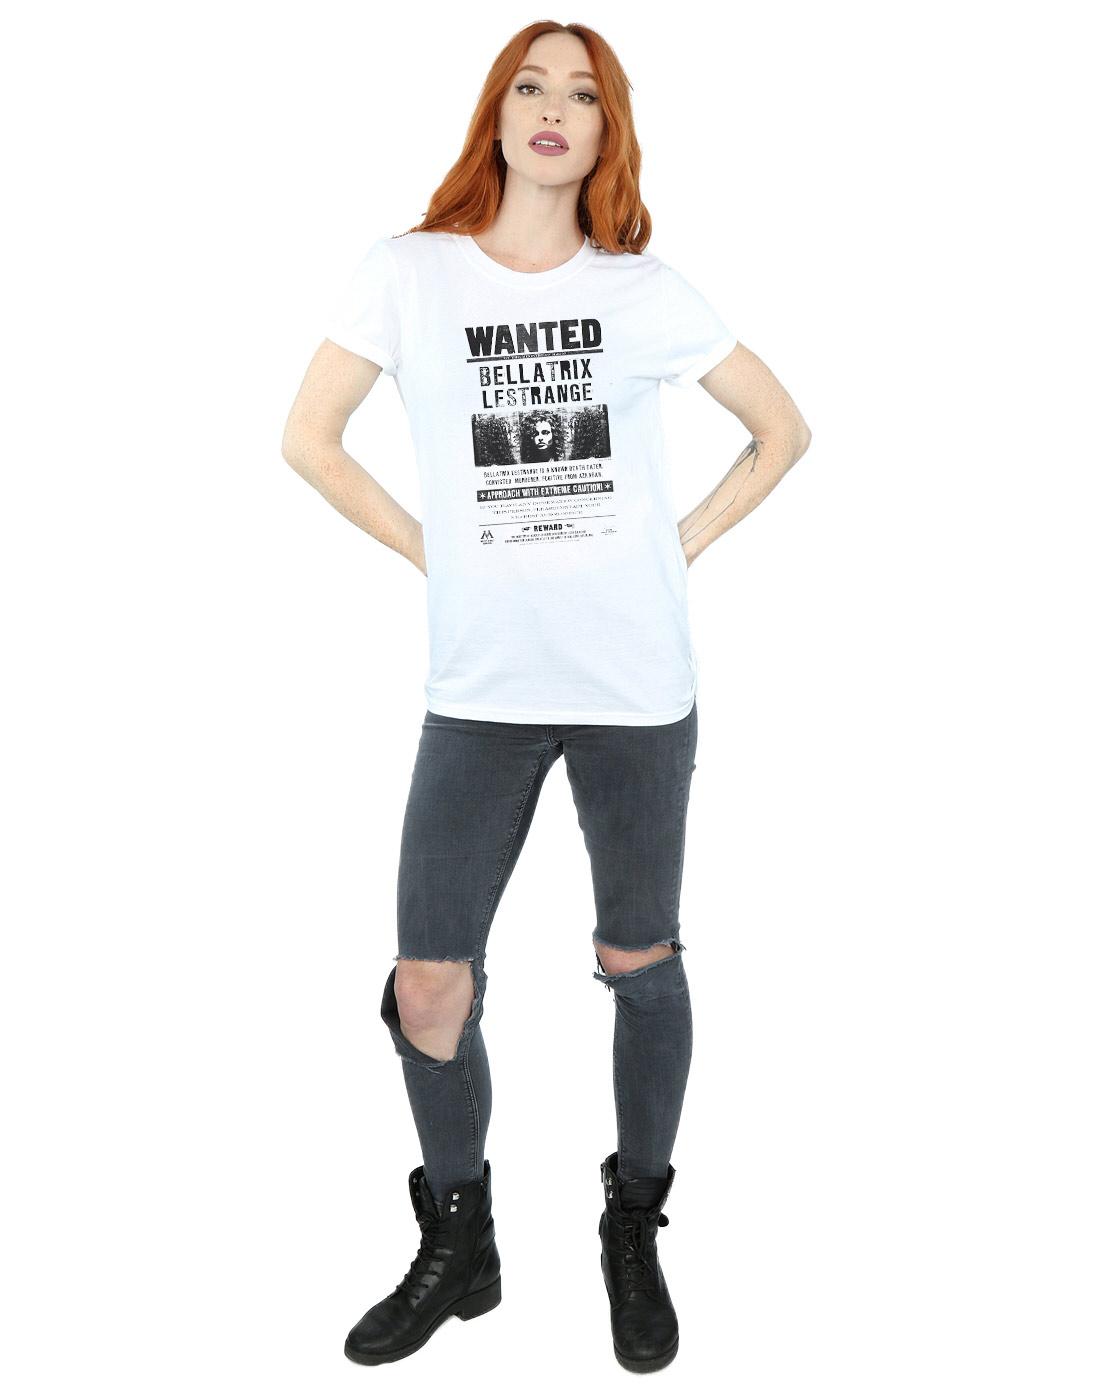 Harry Potter Damen Bellatrix Lestrange Wanted Boyfriend Fit T-Shirt